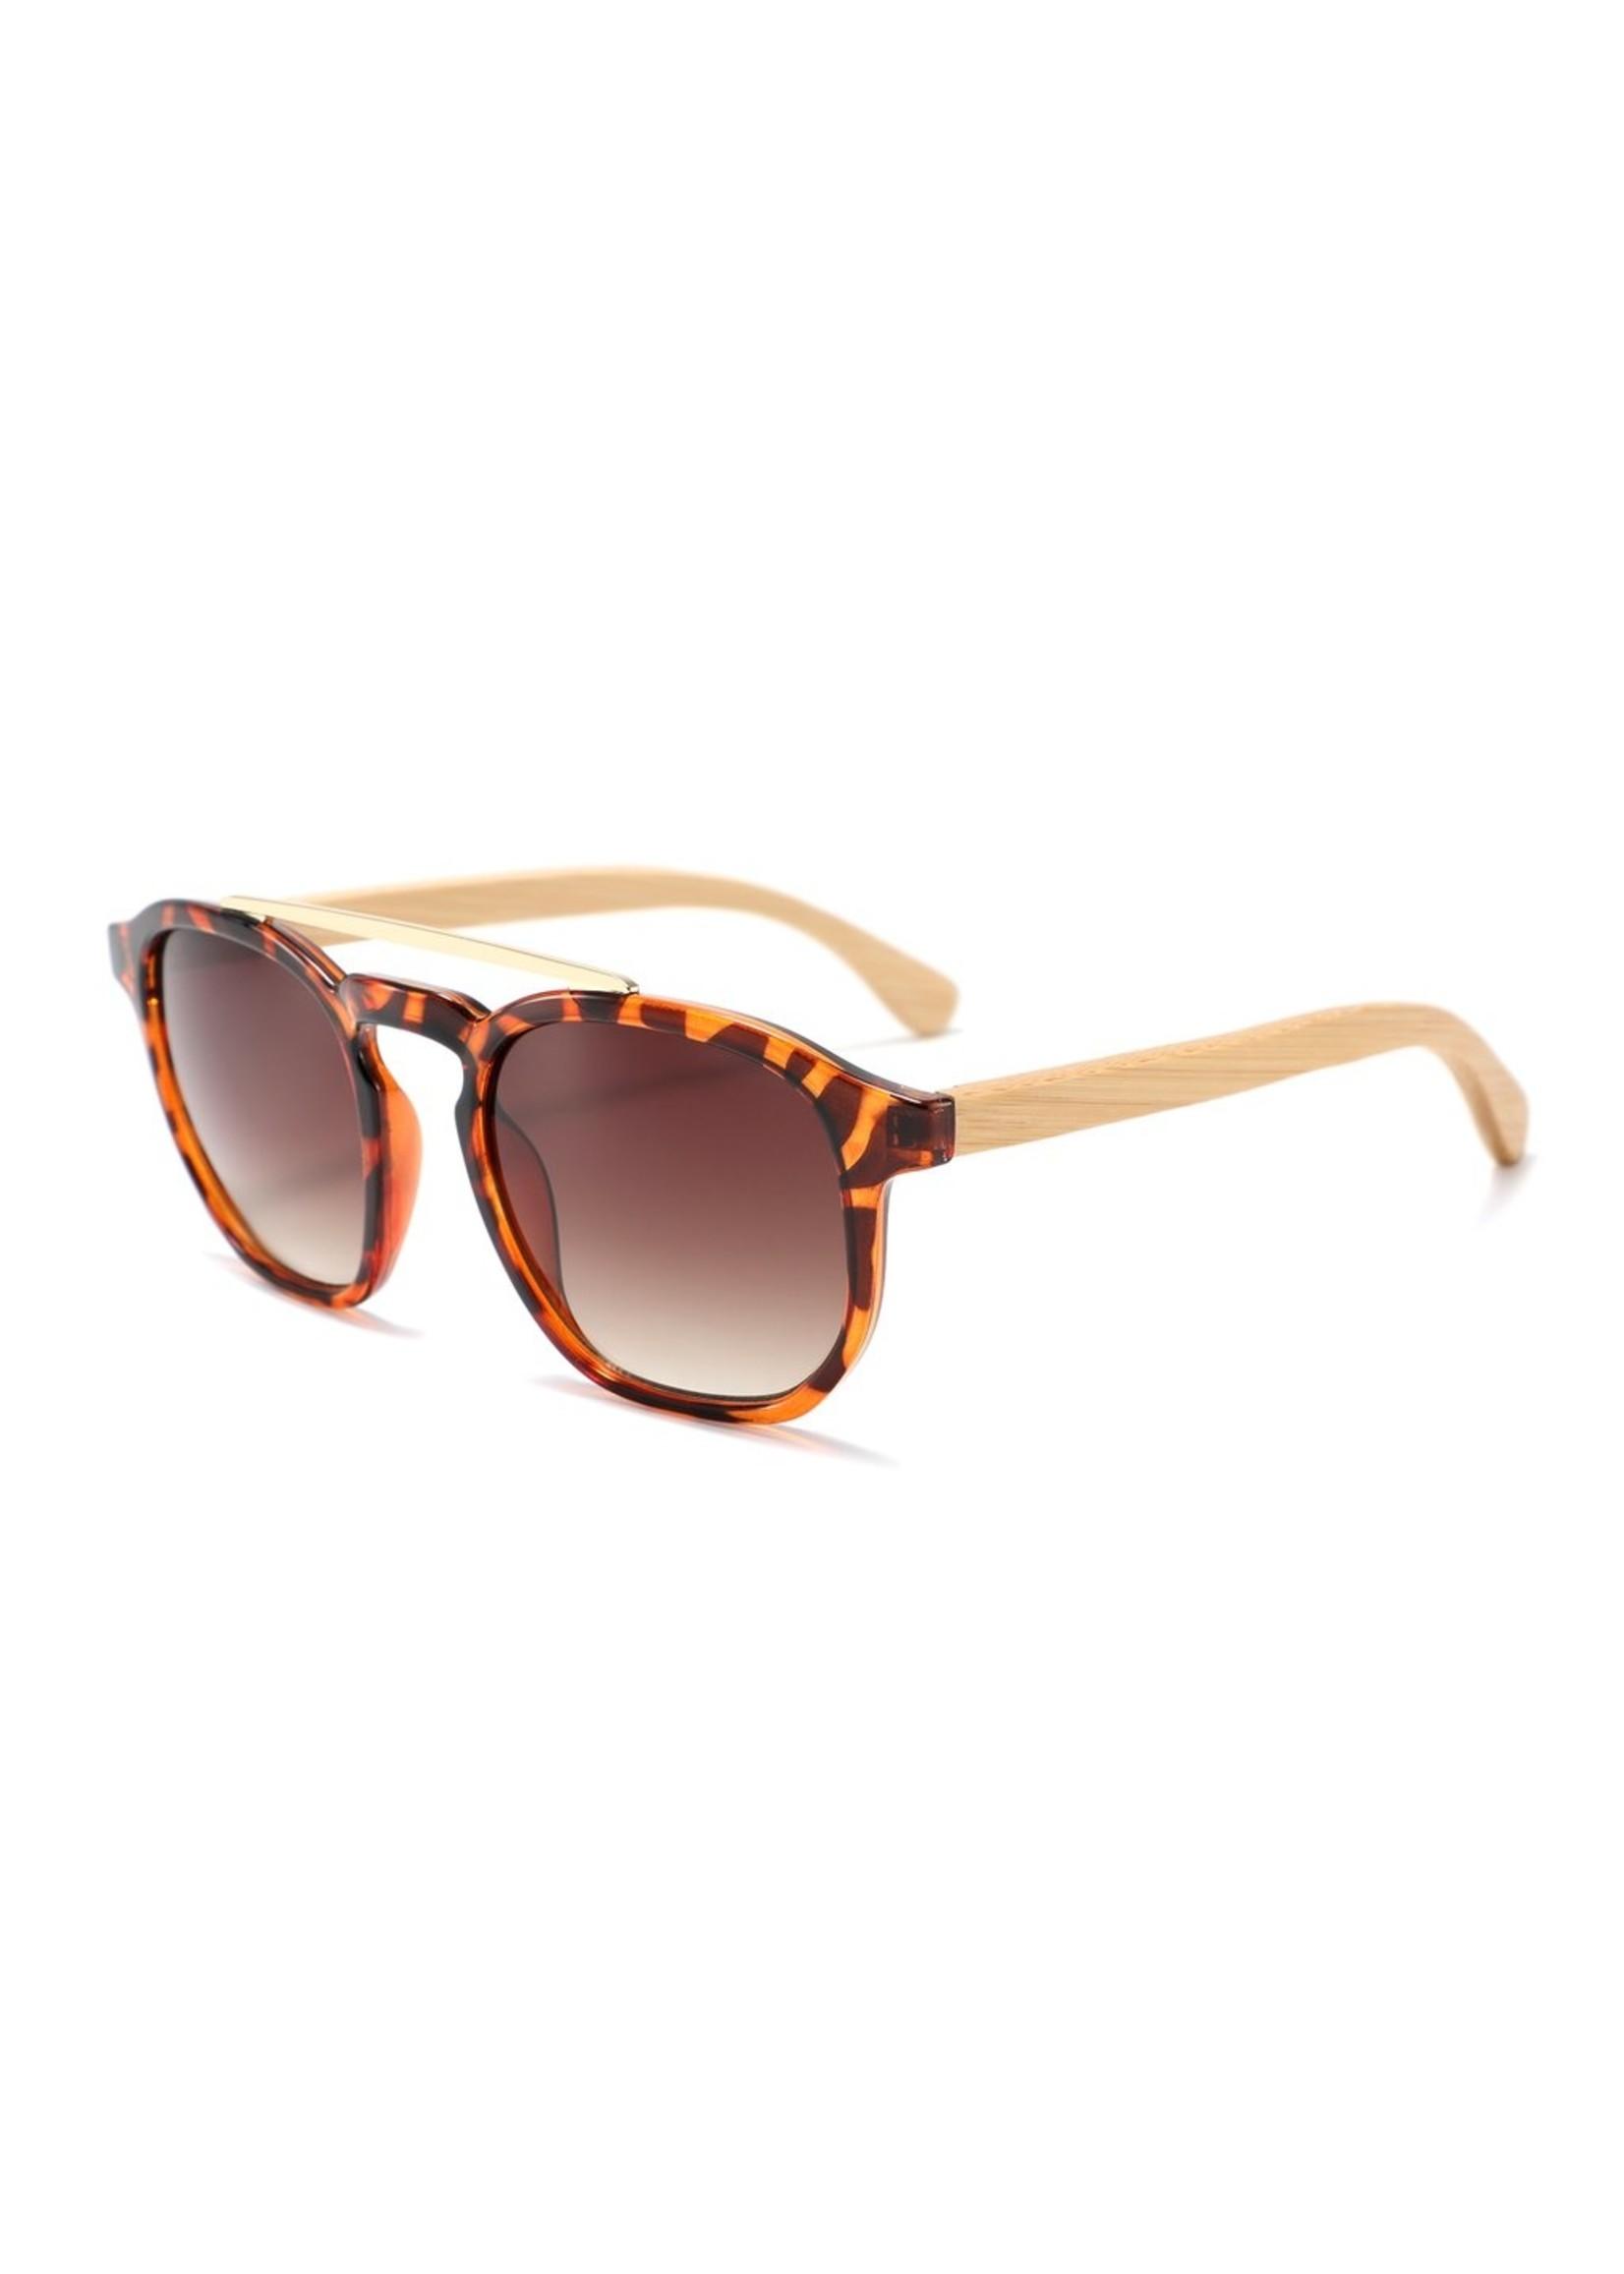 Kuma Sunglasses Eucalyptus - Tortoise